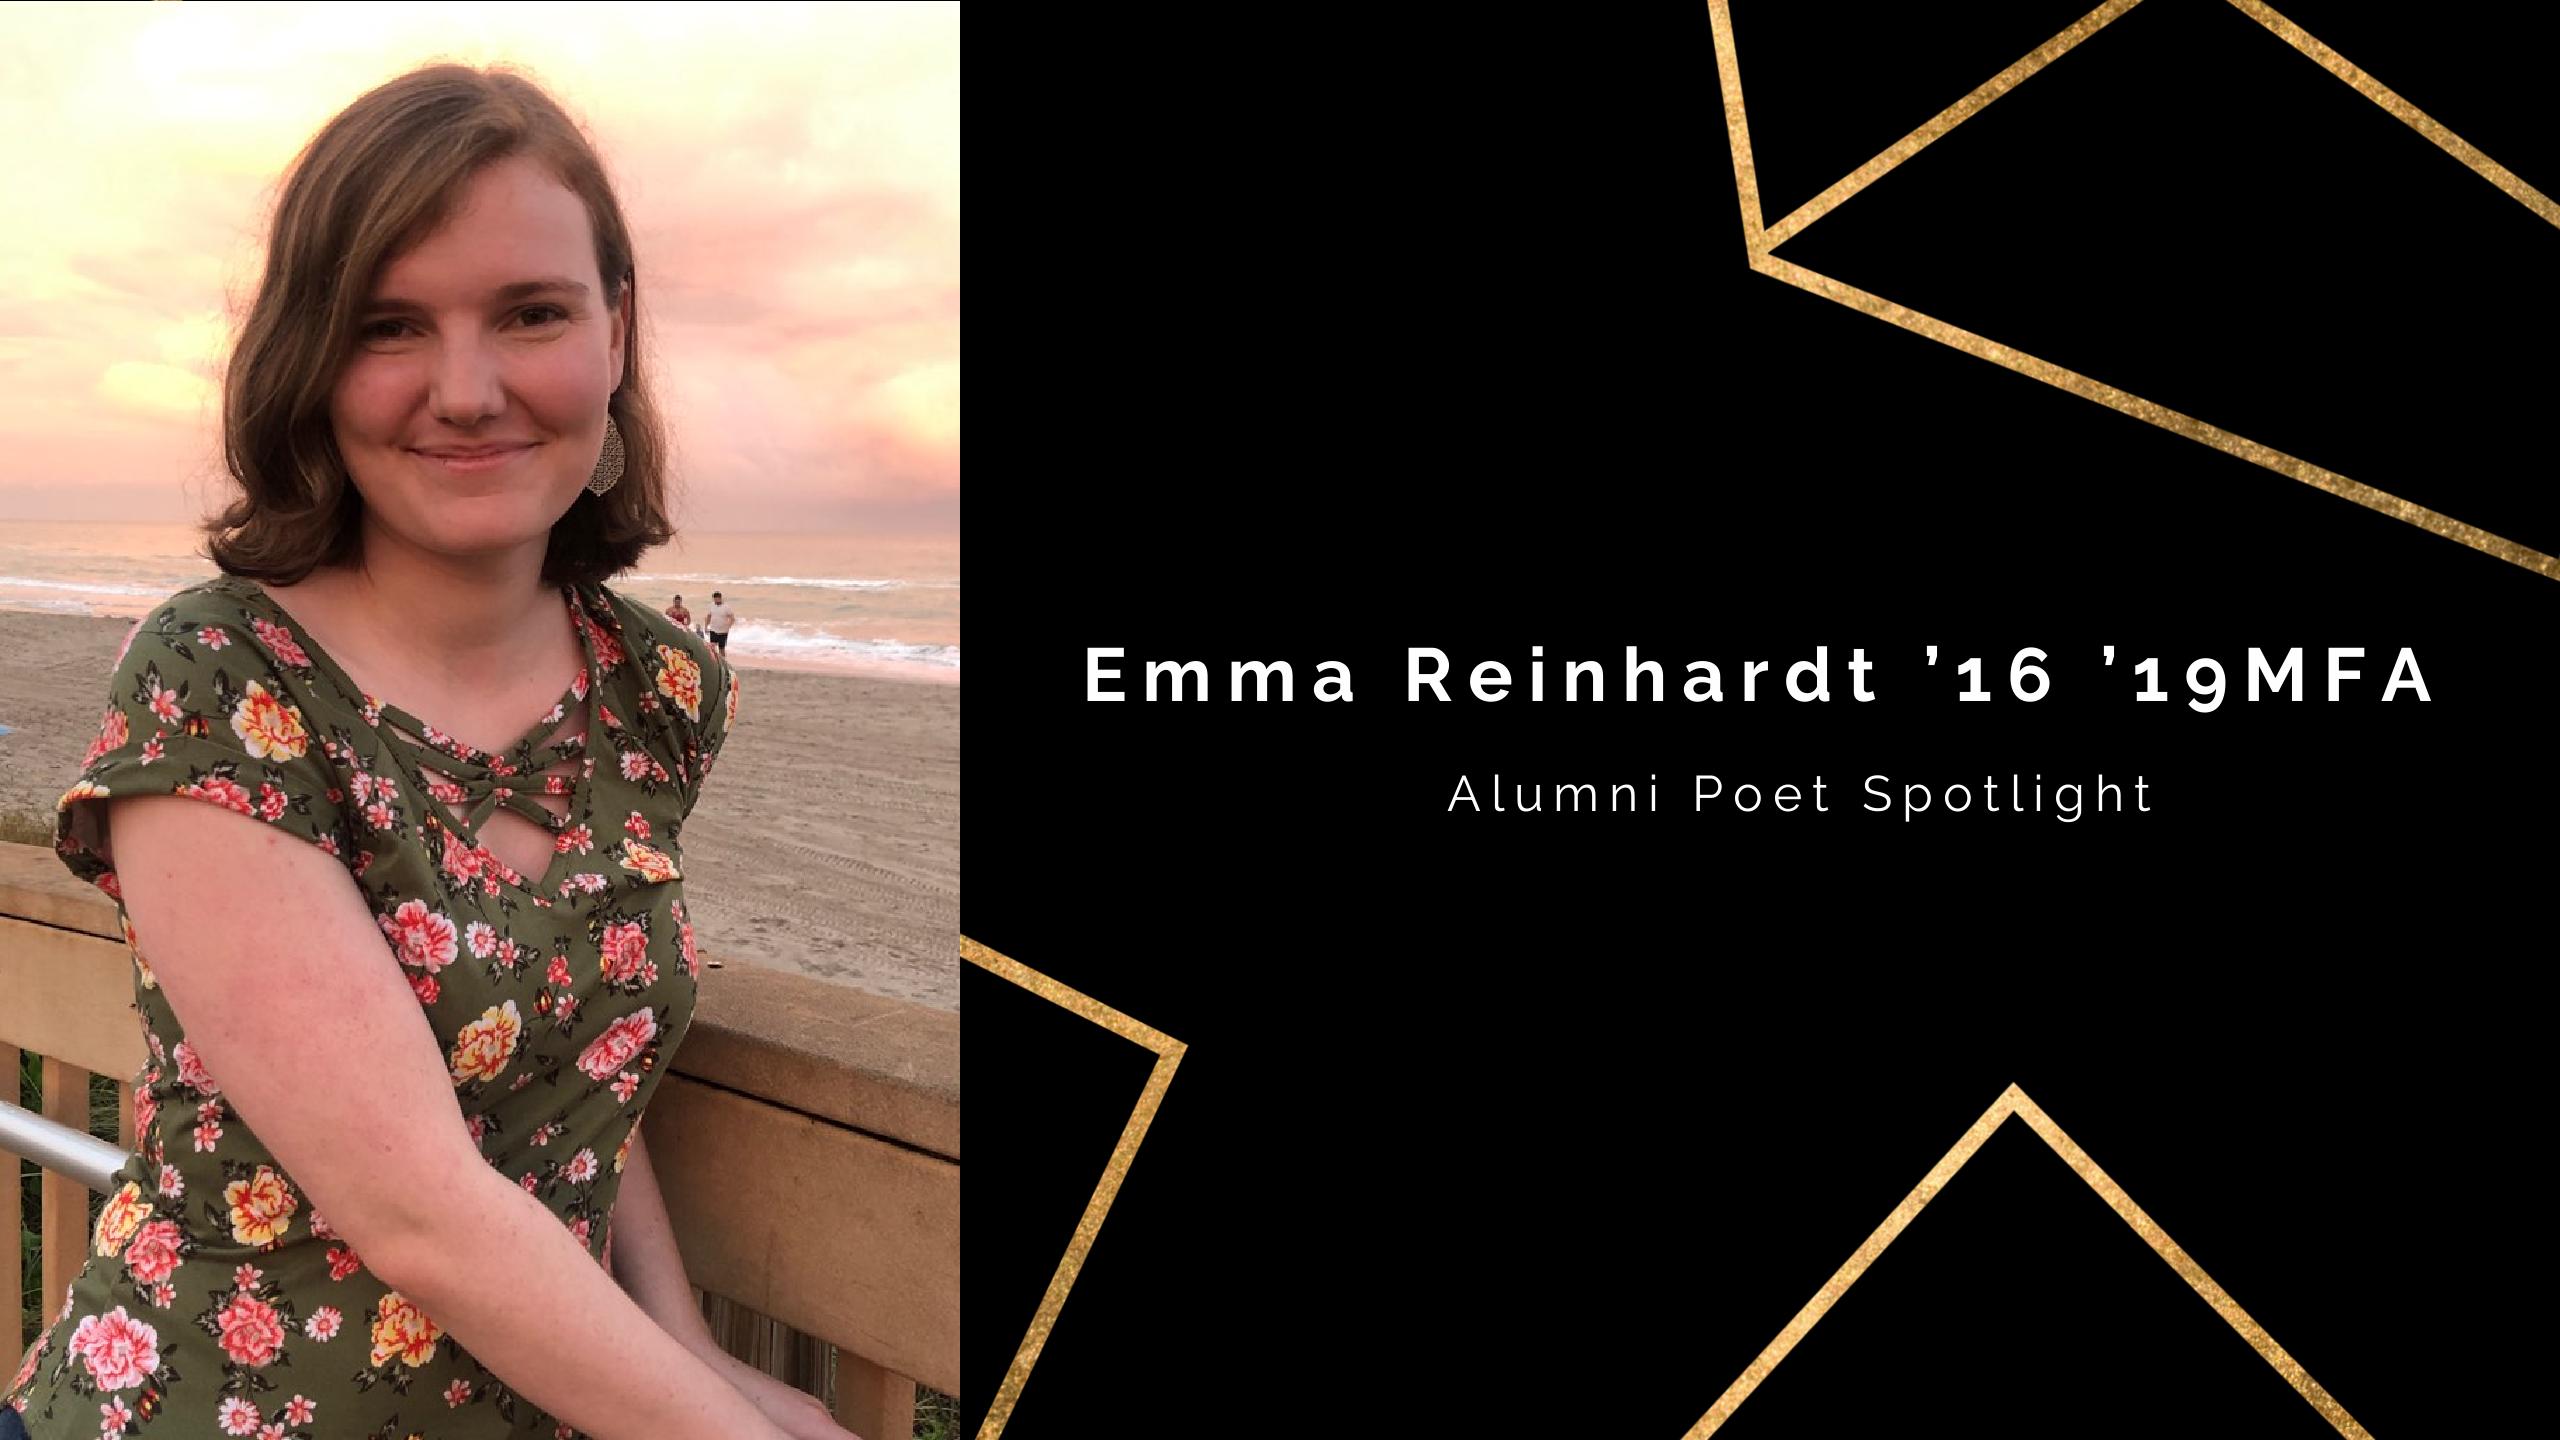 Black background with headshot of Emma Reinhardt '16 '19MFA